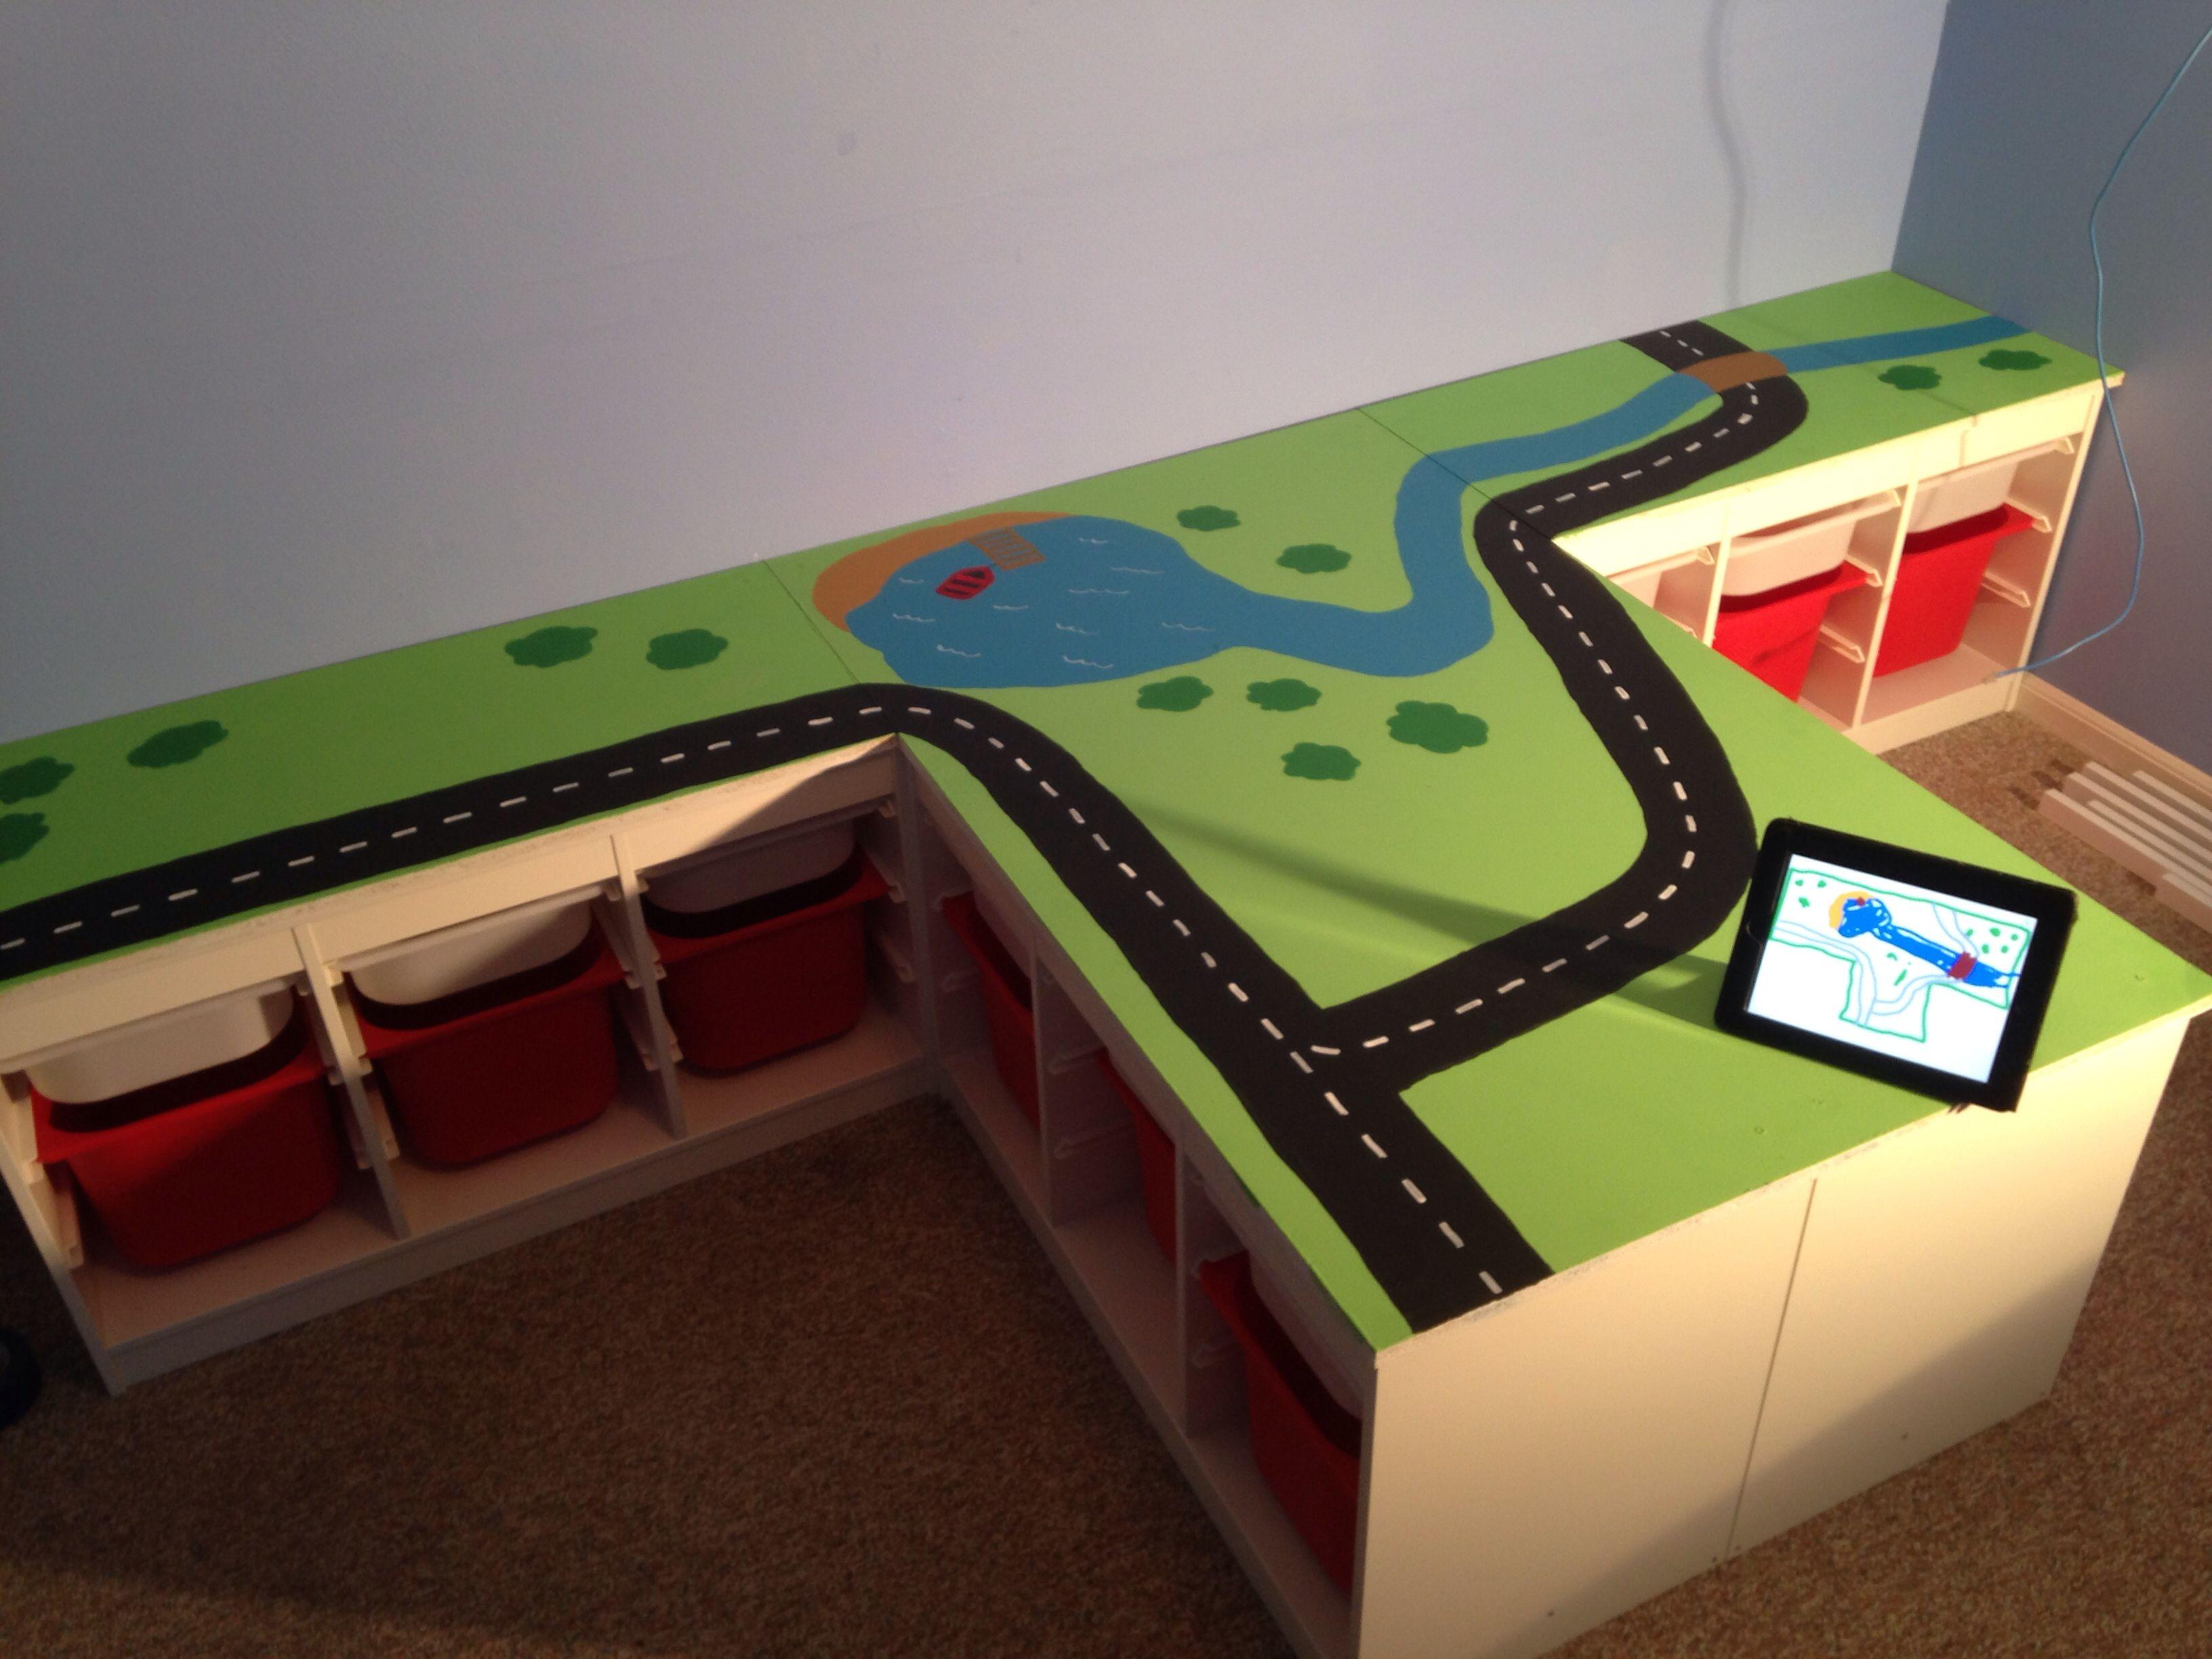 Custom train table with ikea shelves the ipad shows my son 39 s concept for - Customiser table ikea ...